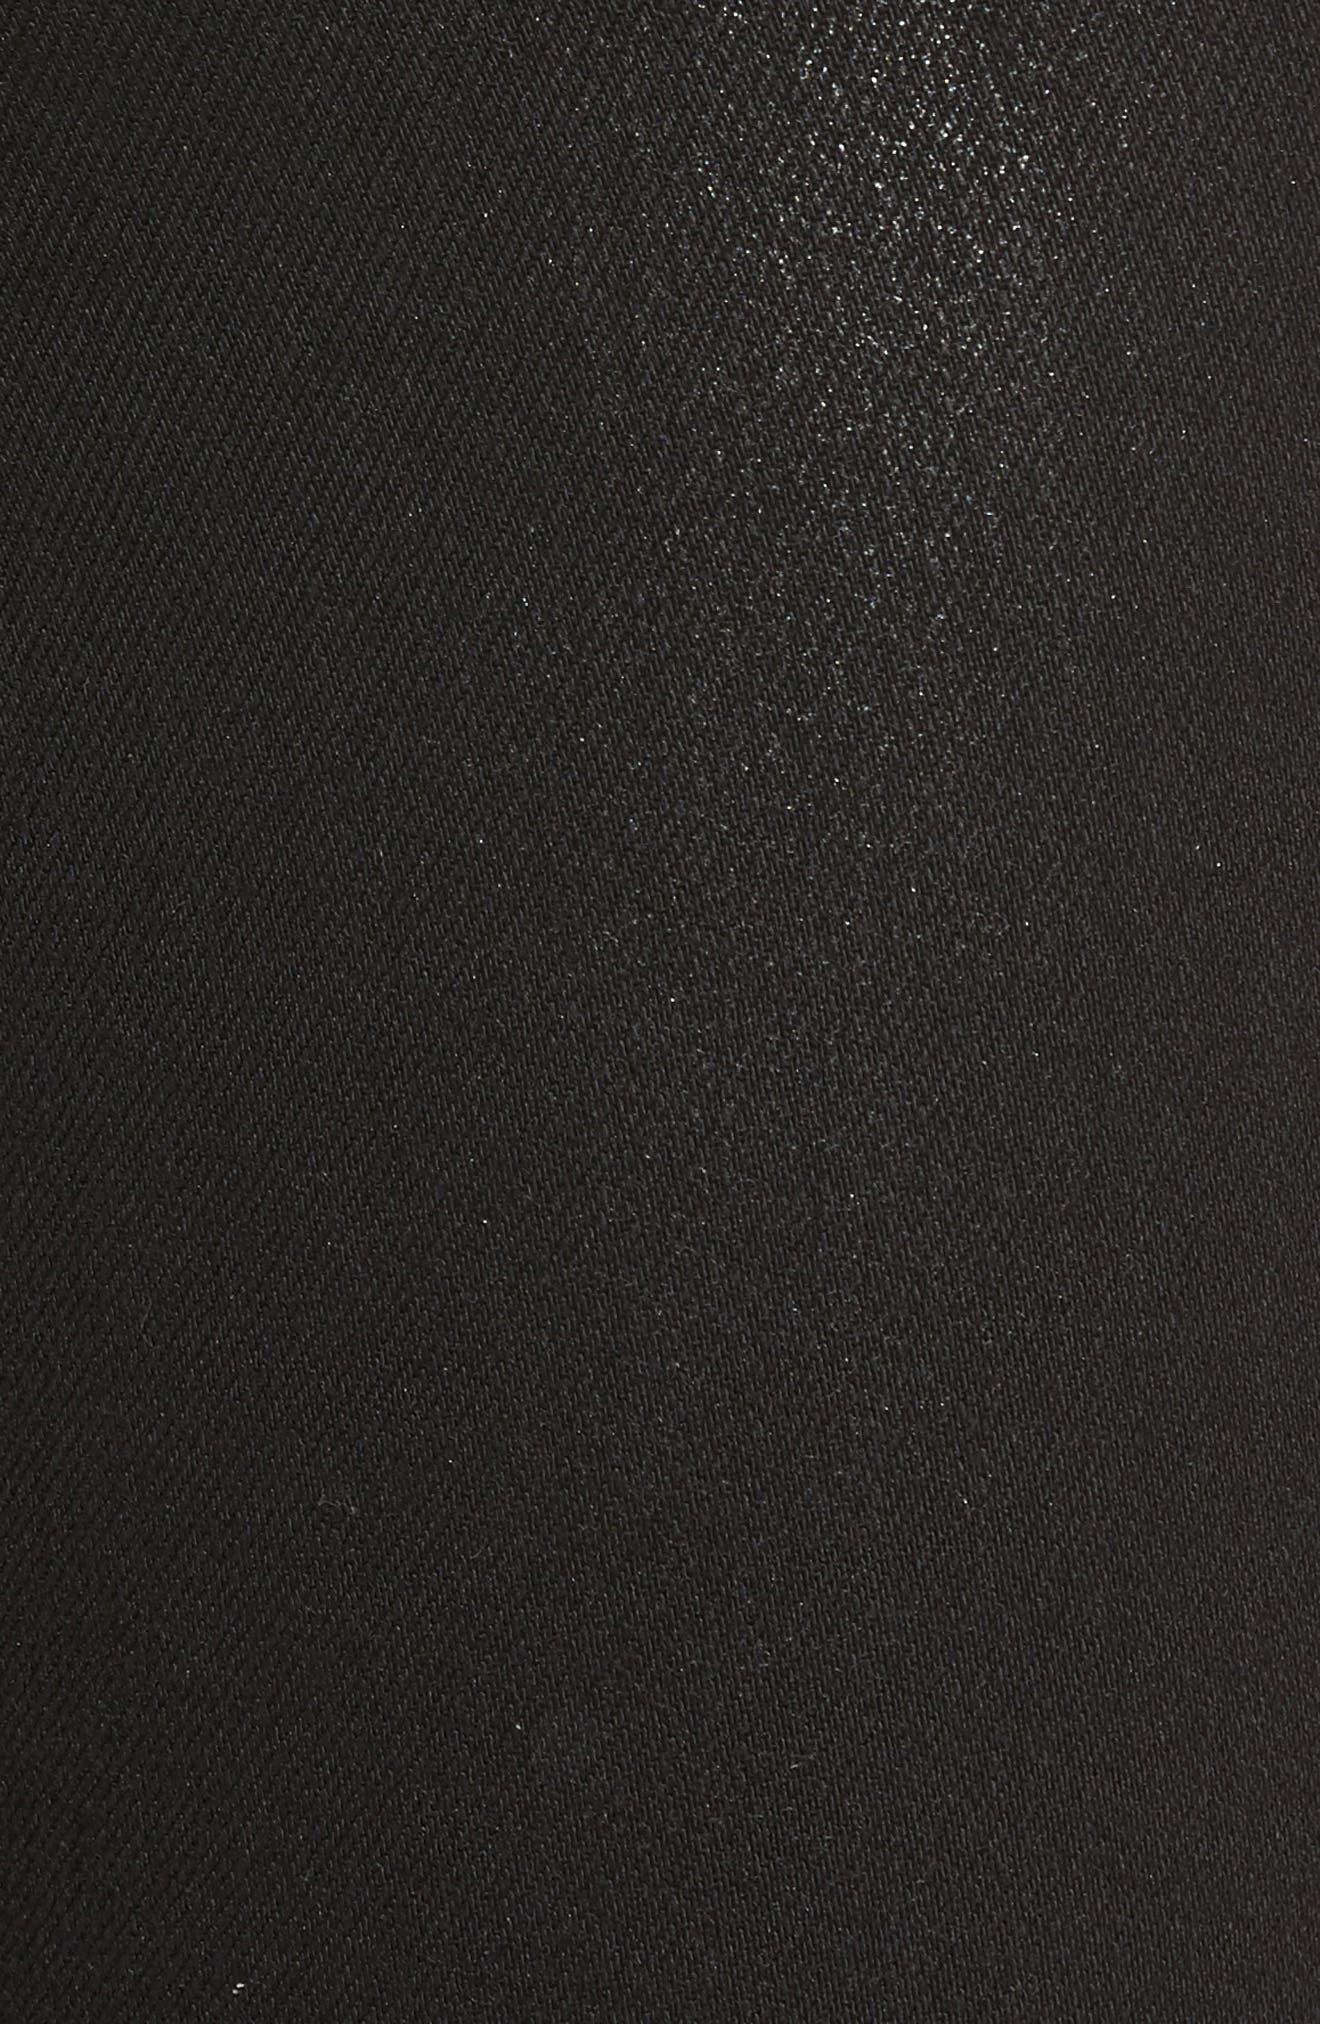 Kooper Coated Skinny Jeans,                             Alternate thumbnail 5, color,                             001